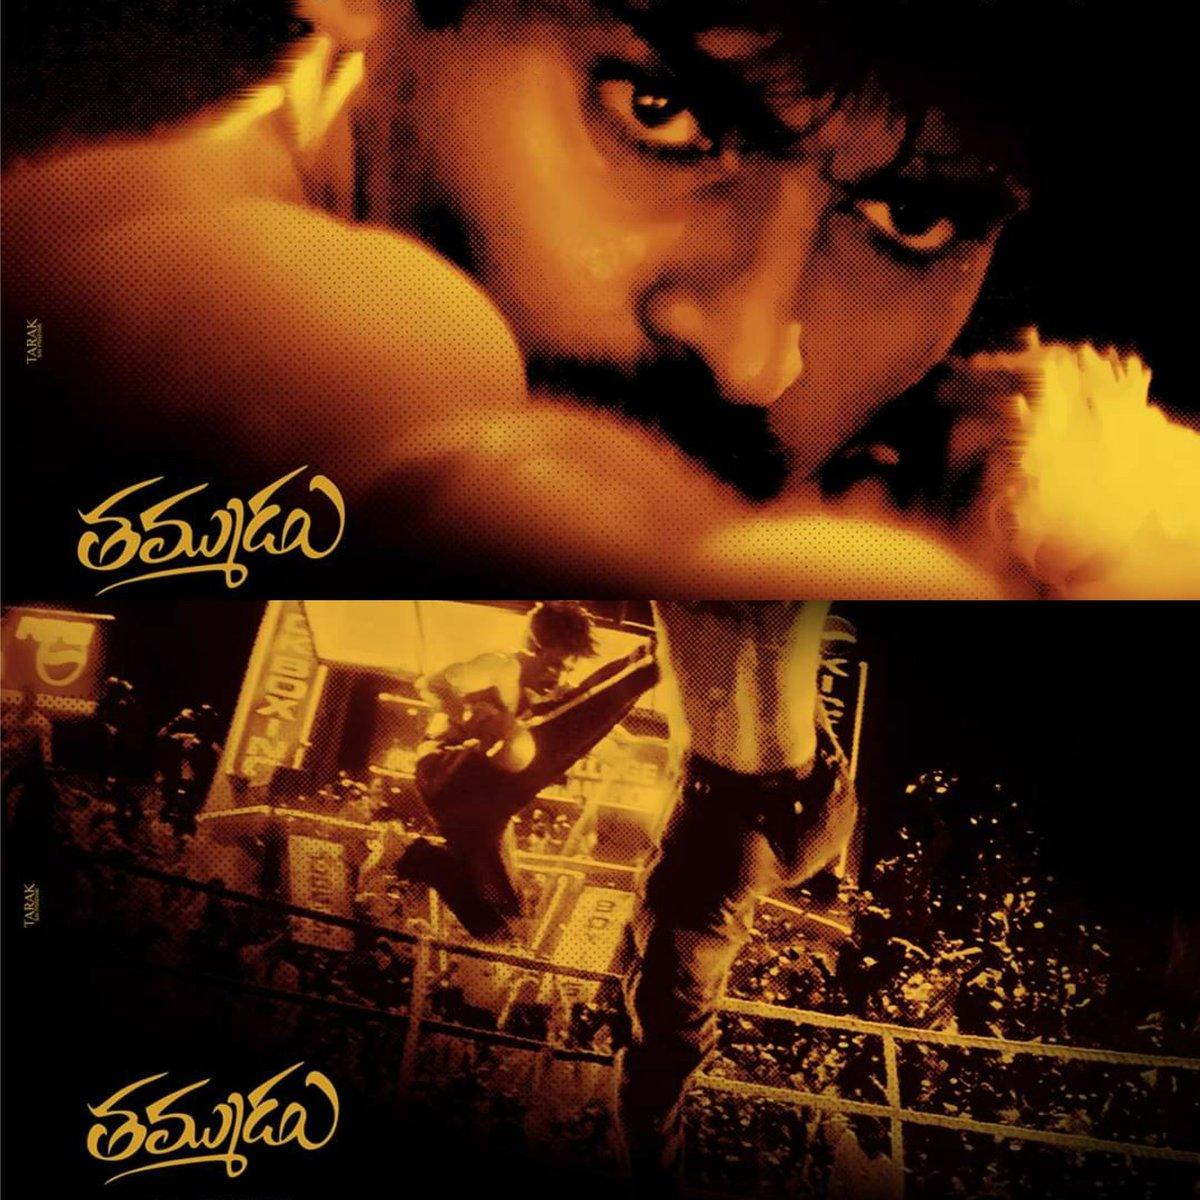 #Recreating #Thammudu.... Classic movie of #Powerstar elanti movie okati padidithe vereylevel 🔥🔥🙏 vuntadi... #PSPK26 #PSPK27 #PSPK28... Credits: @Thyview 👌